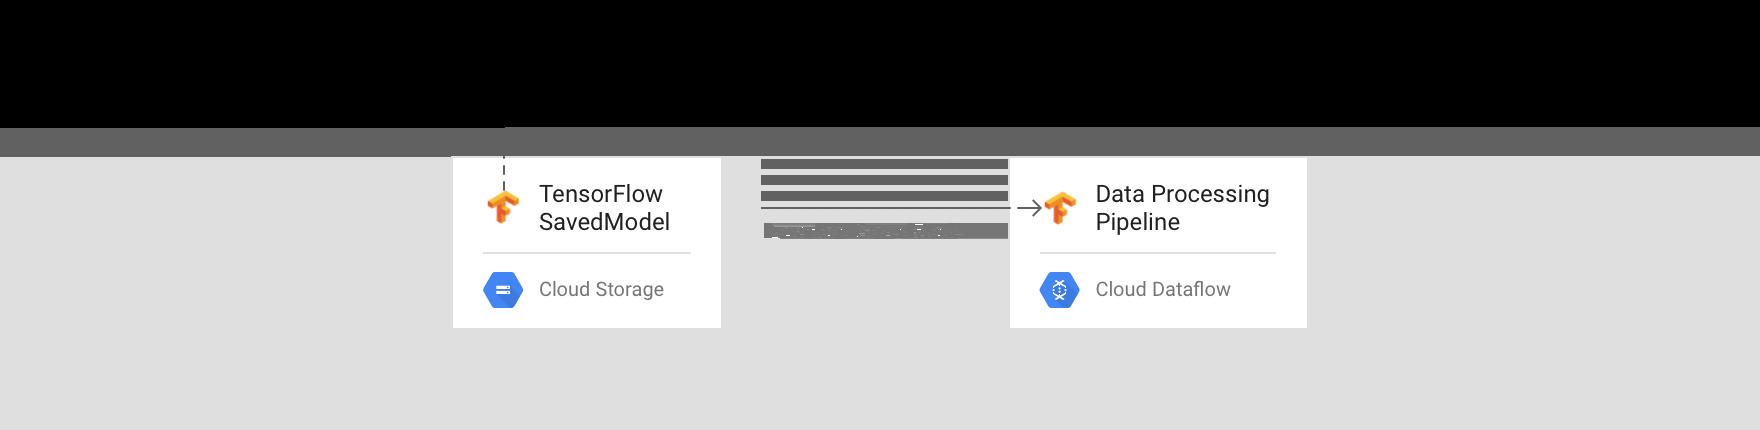 Dataflow에서의 직접 모델 예측